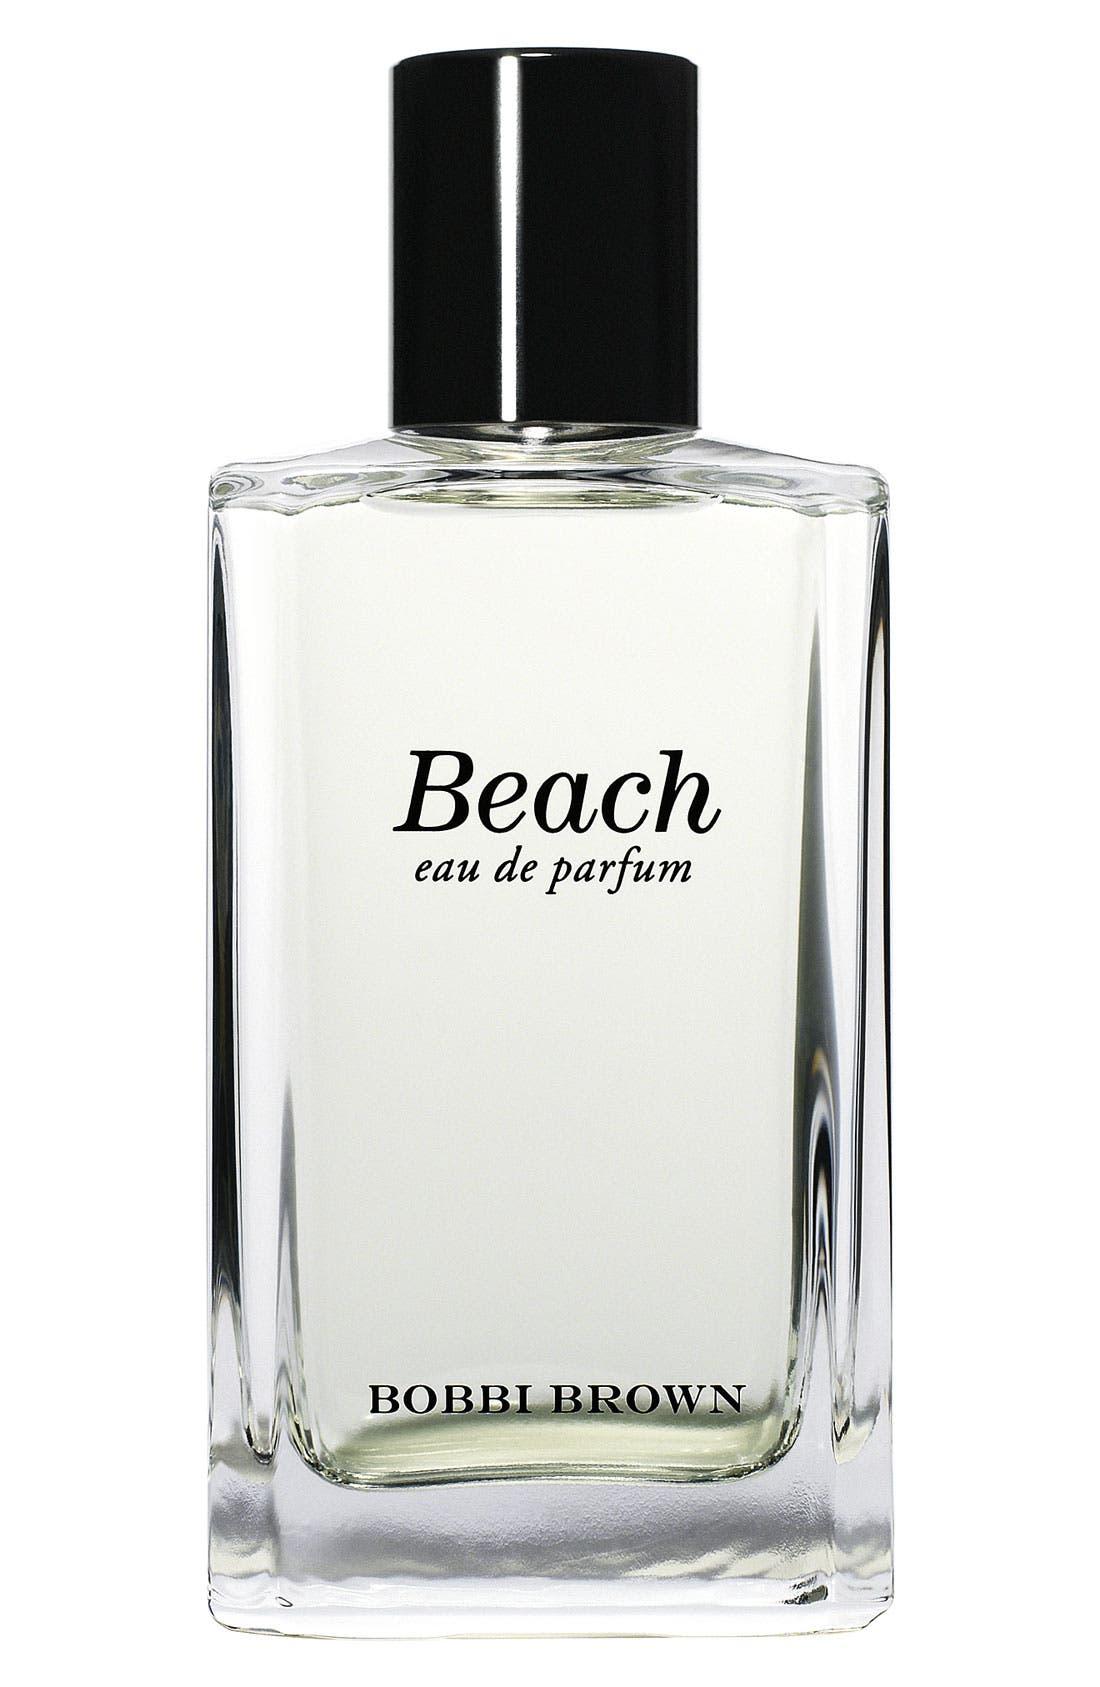 Bobbi Brown 'beach' Eau de Parfum